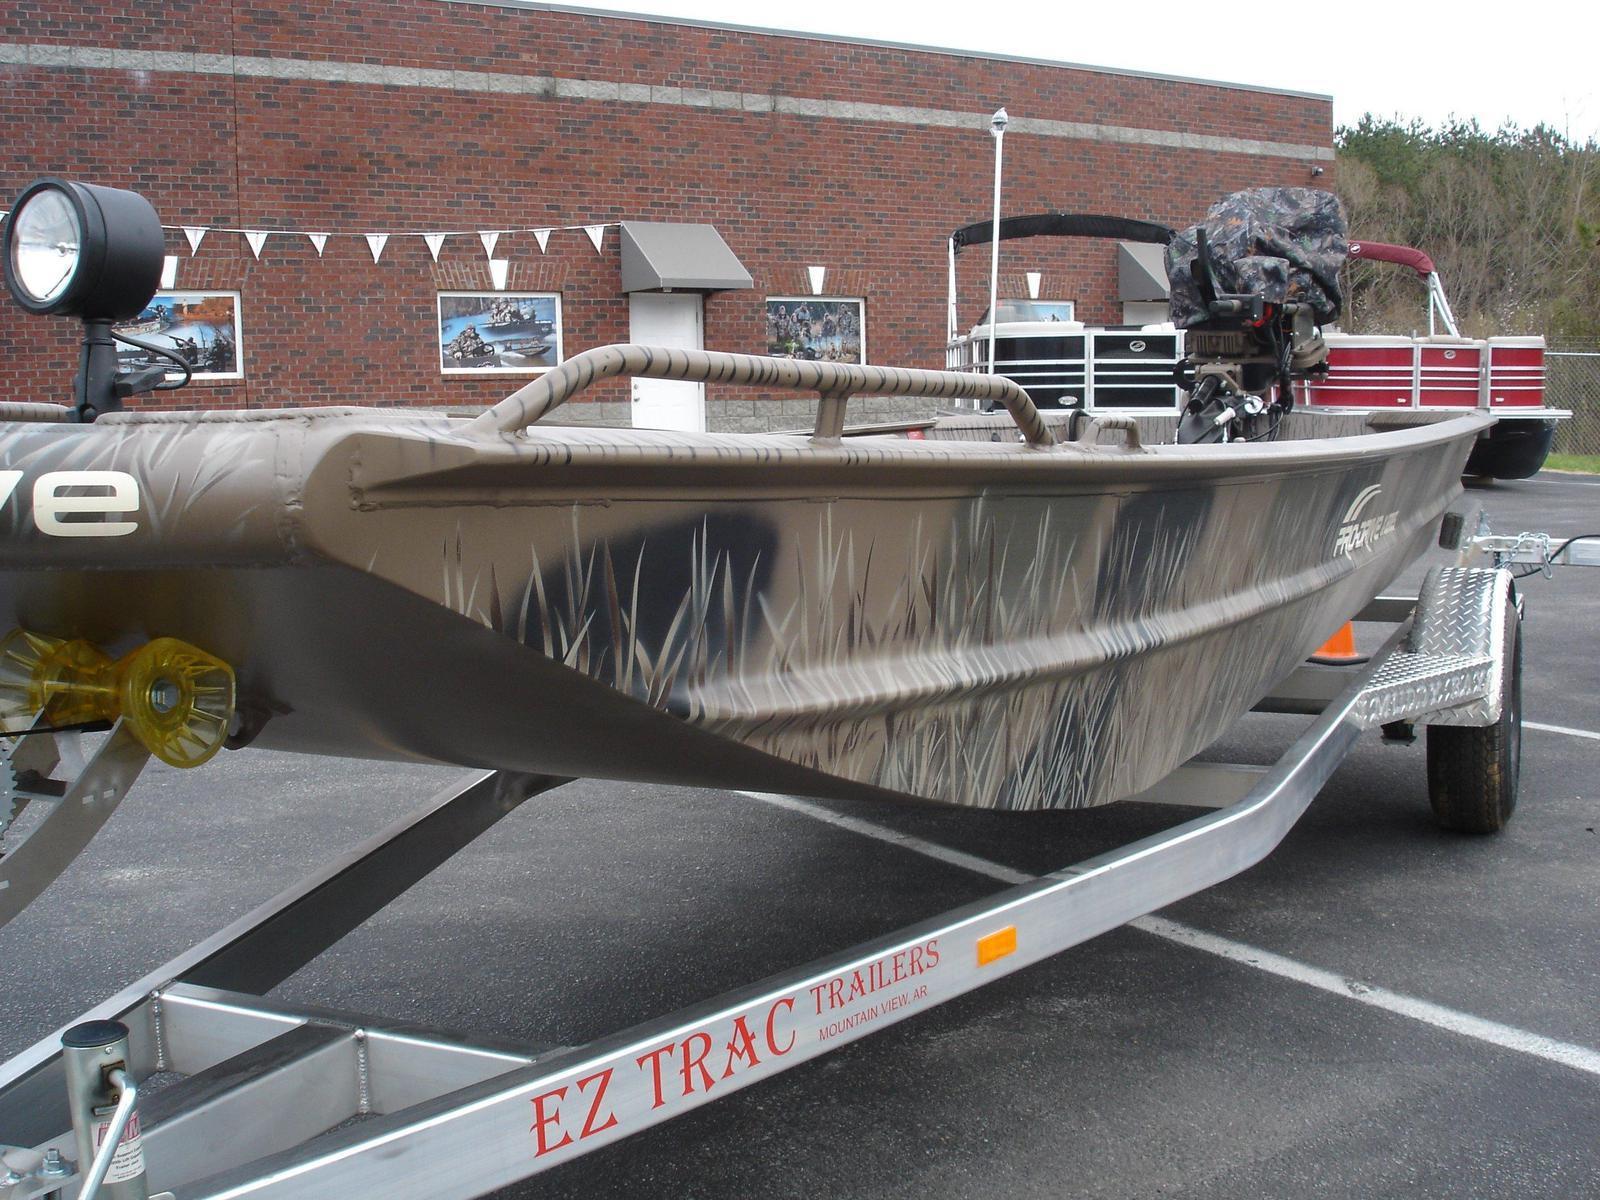 Inventory from Gator Trax and Pro Drive Muddy Bay Marine Newberry